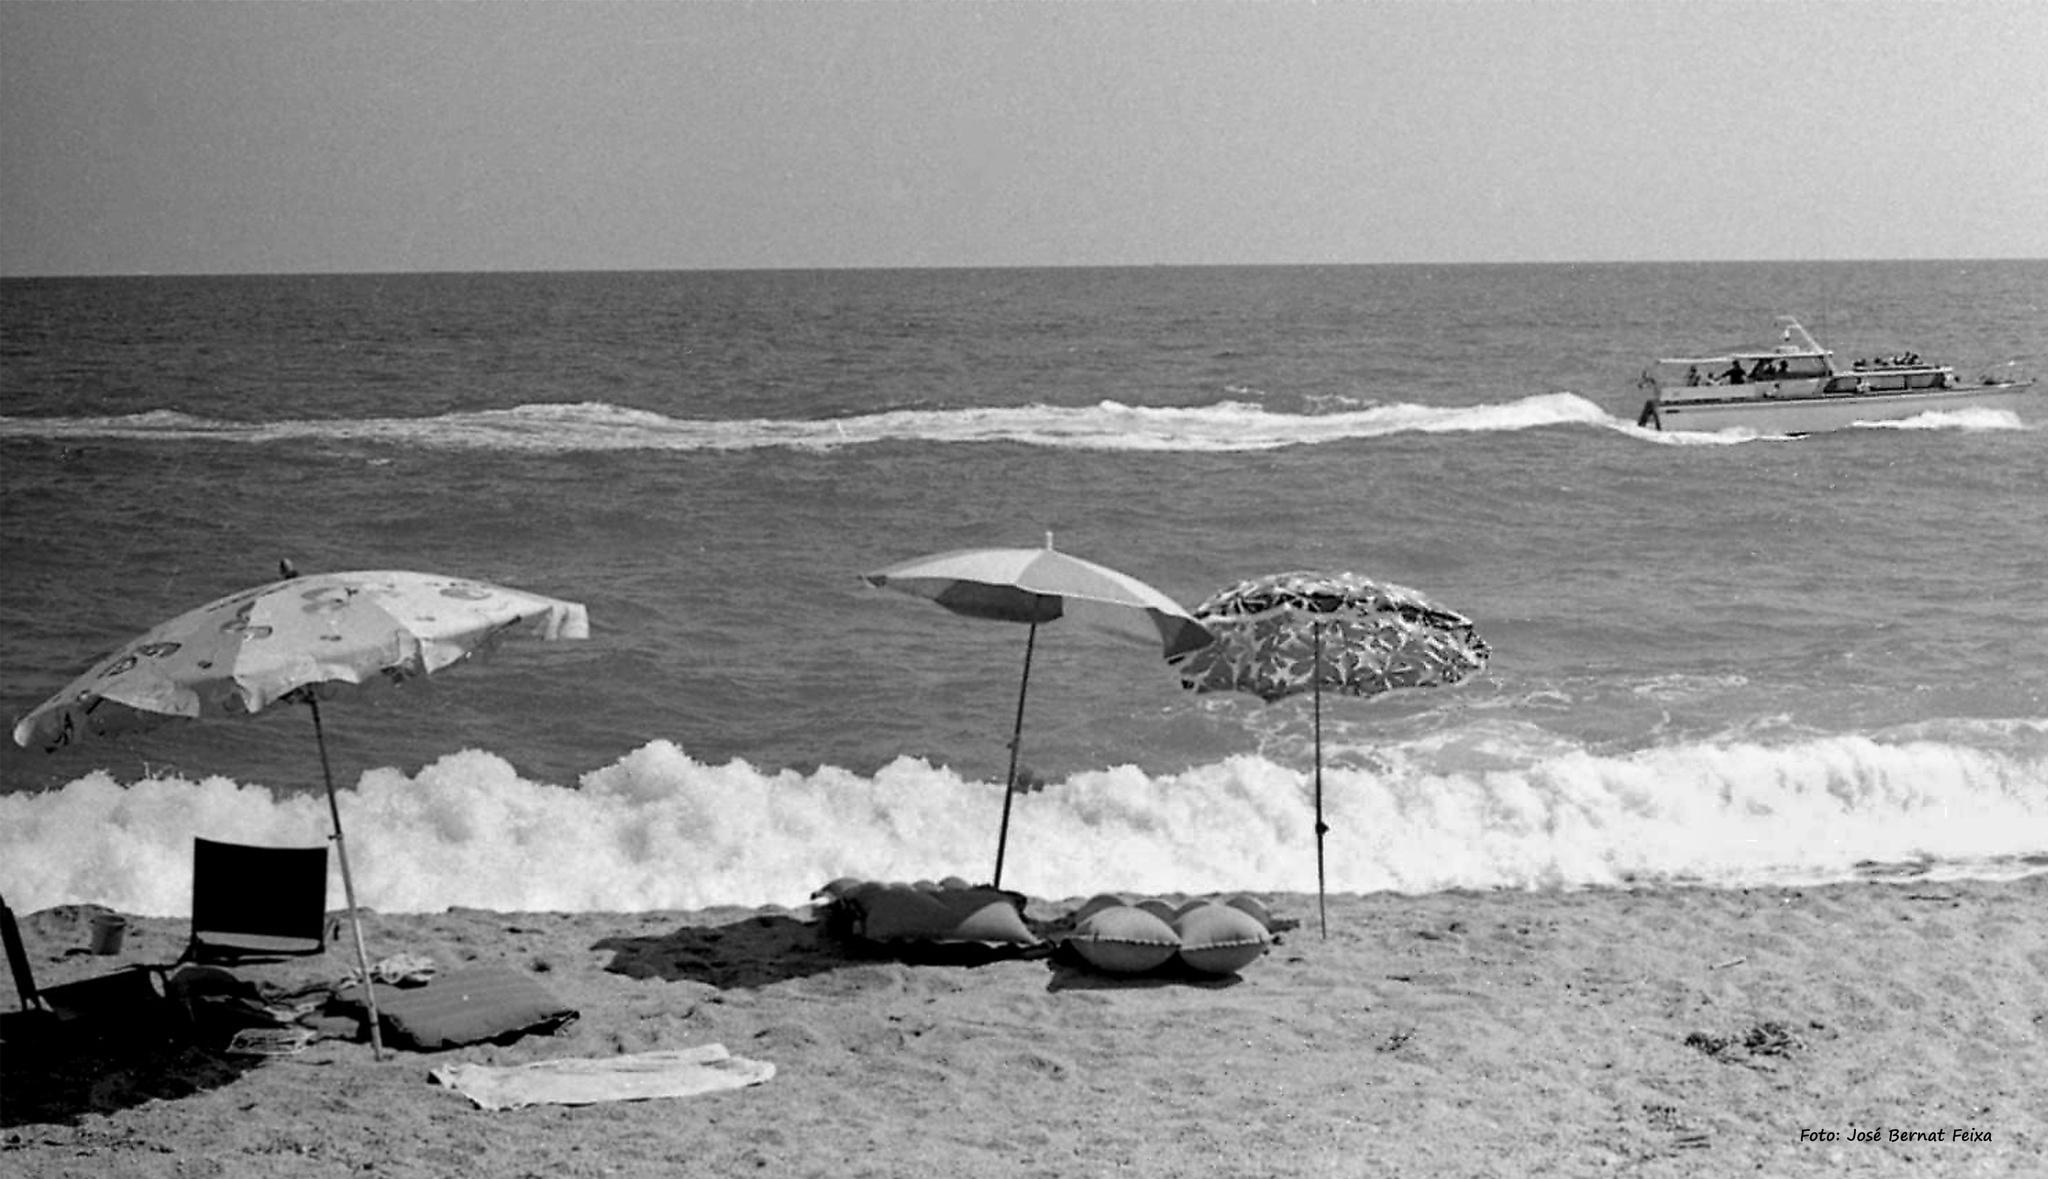 MAR Y PLAYA, ZEE EN STRAND, SEA AND BEACH (60's) by José Bernat Feixa